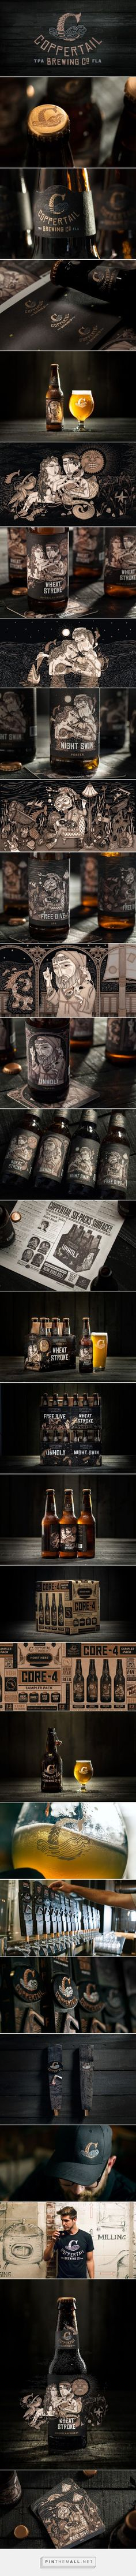 COPPERTAIL Brewing Co. Branding System | Fivestar Branding – Design and Branding Agency & Inspiration Gallery